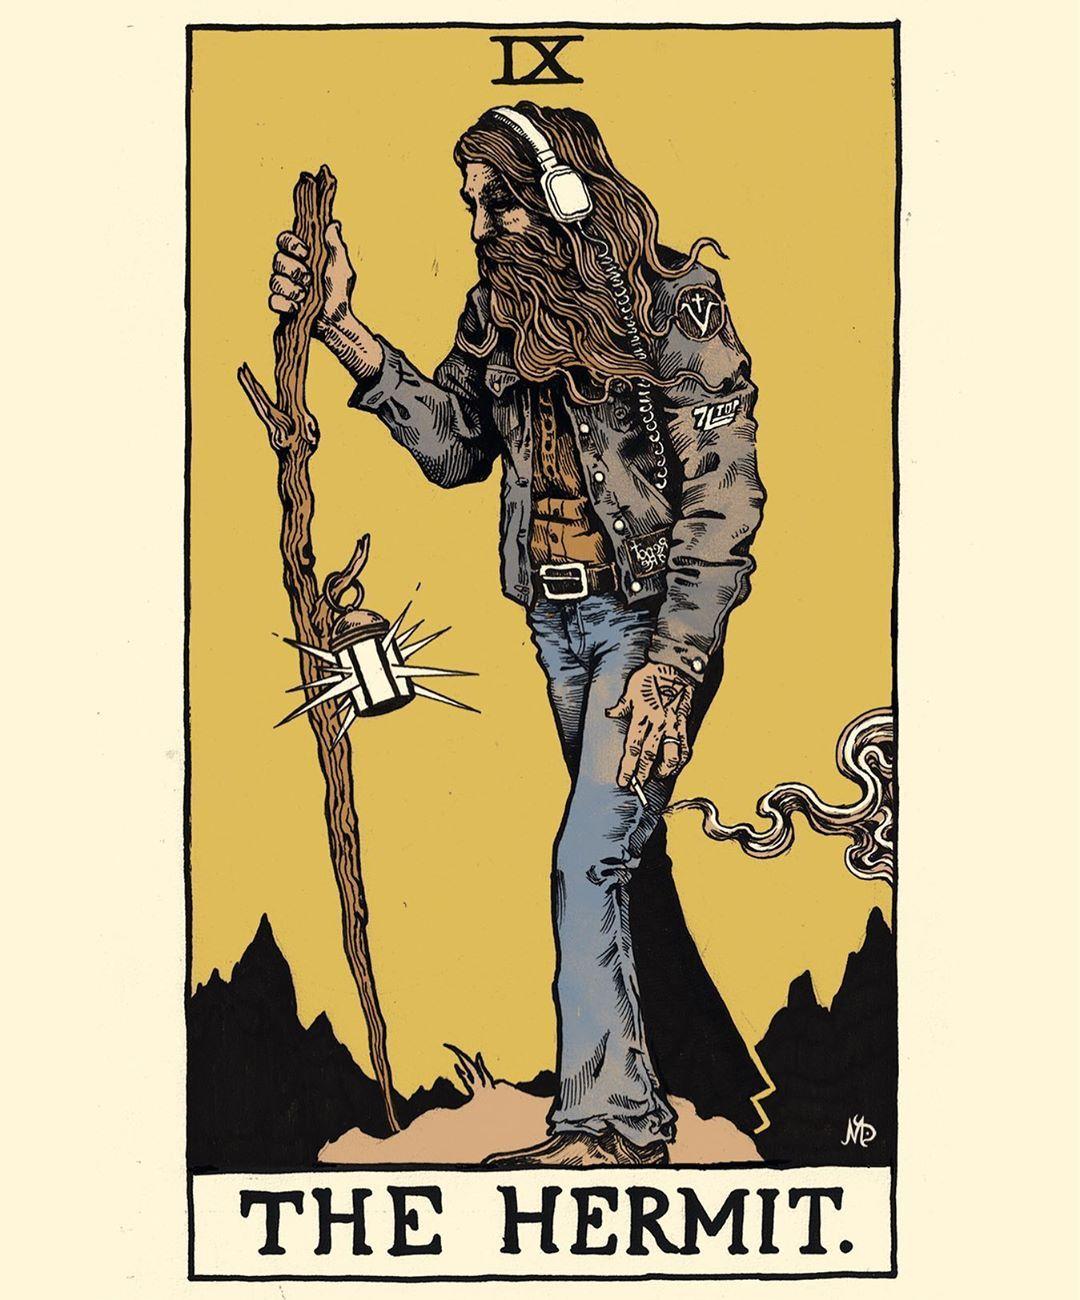 Ix the hermit tarot interpretation tarot cards art tarot